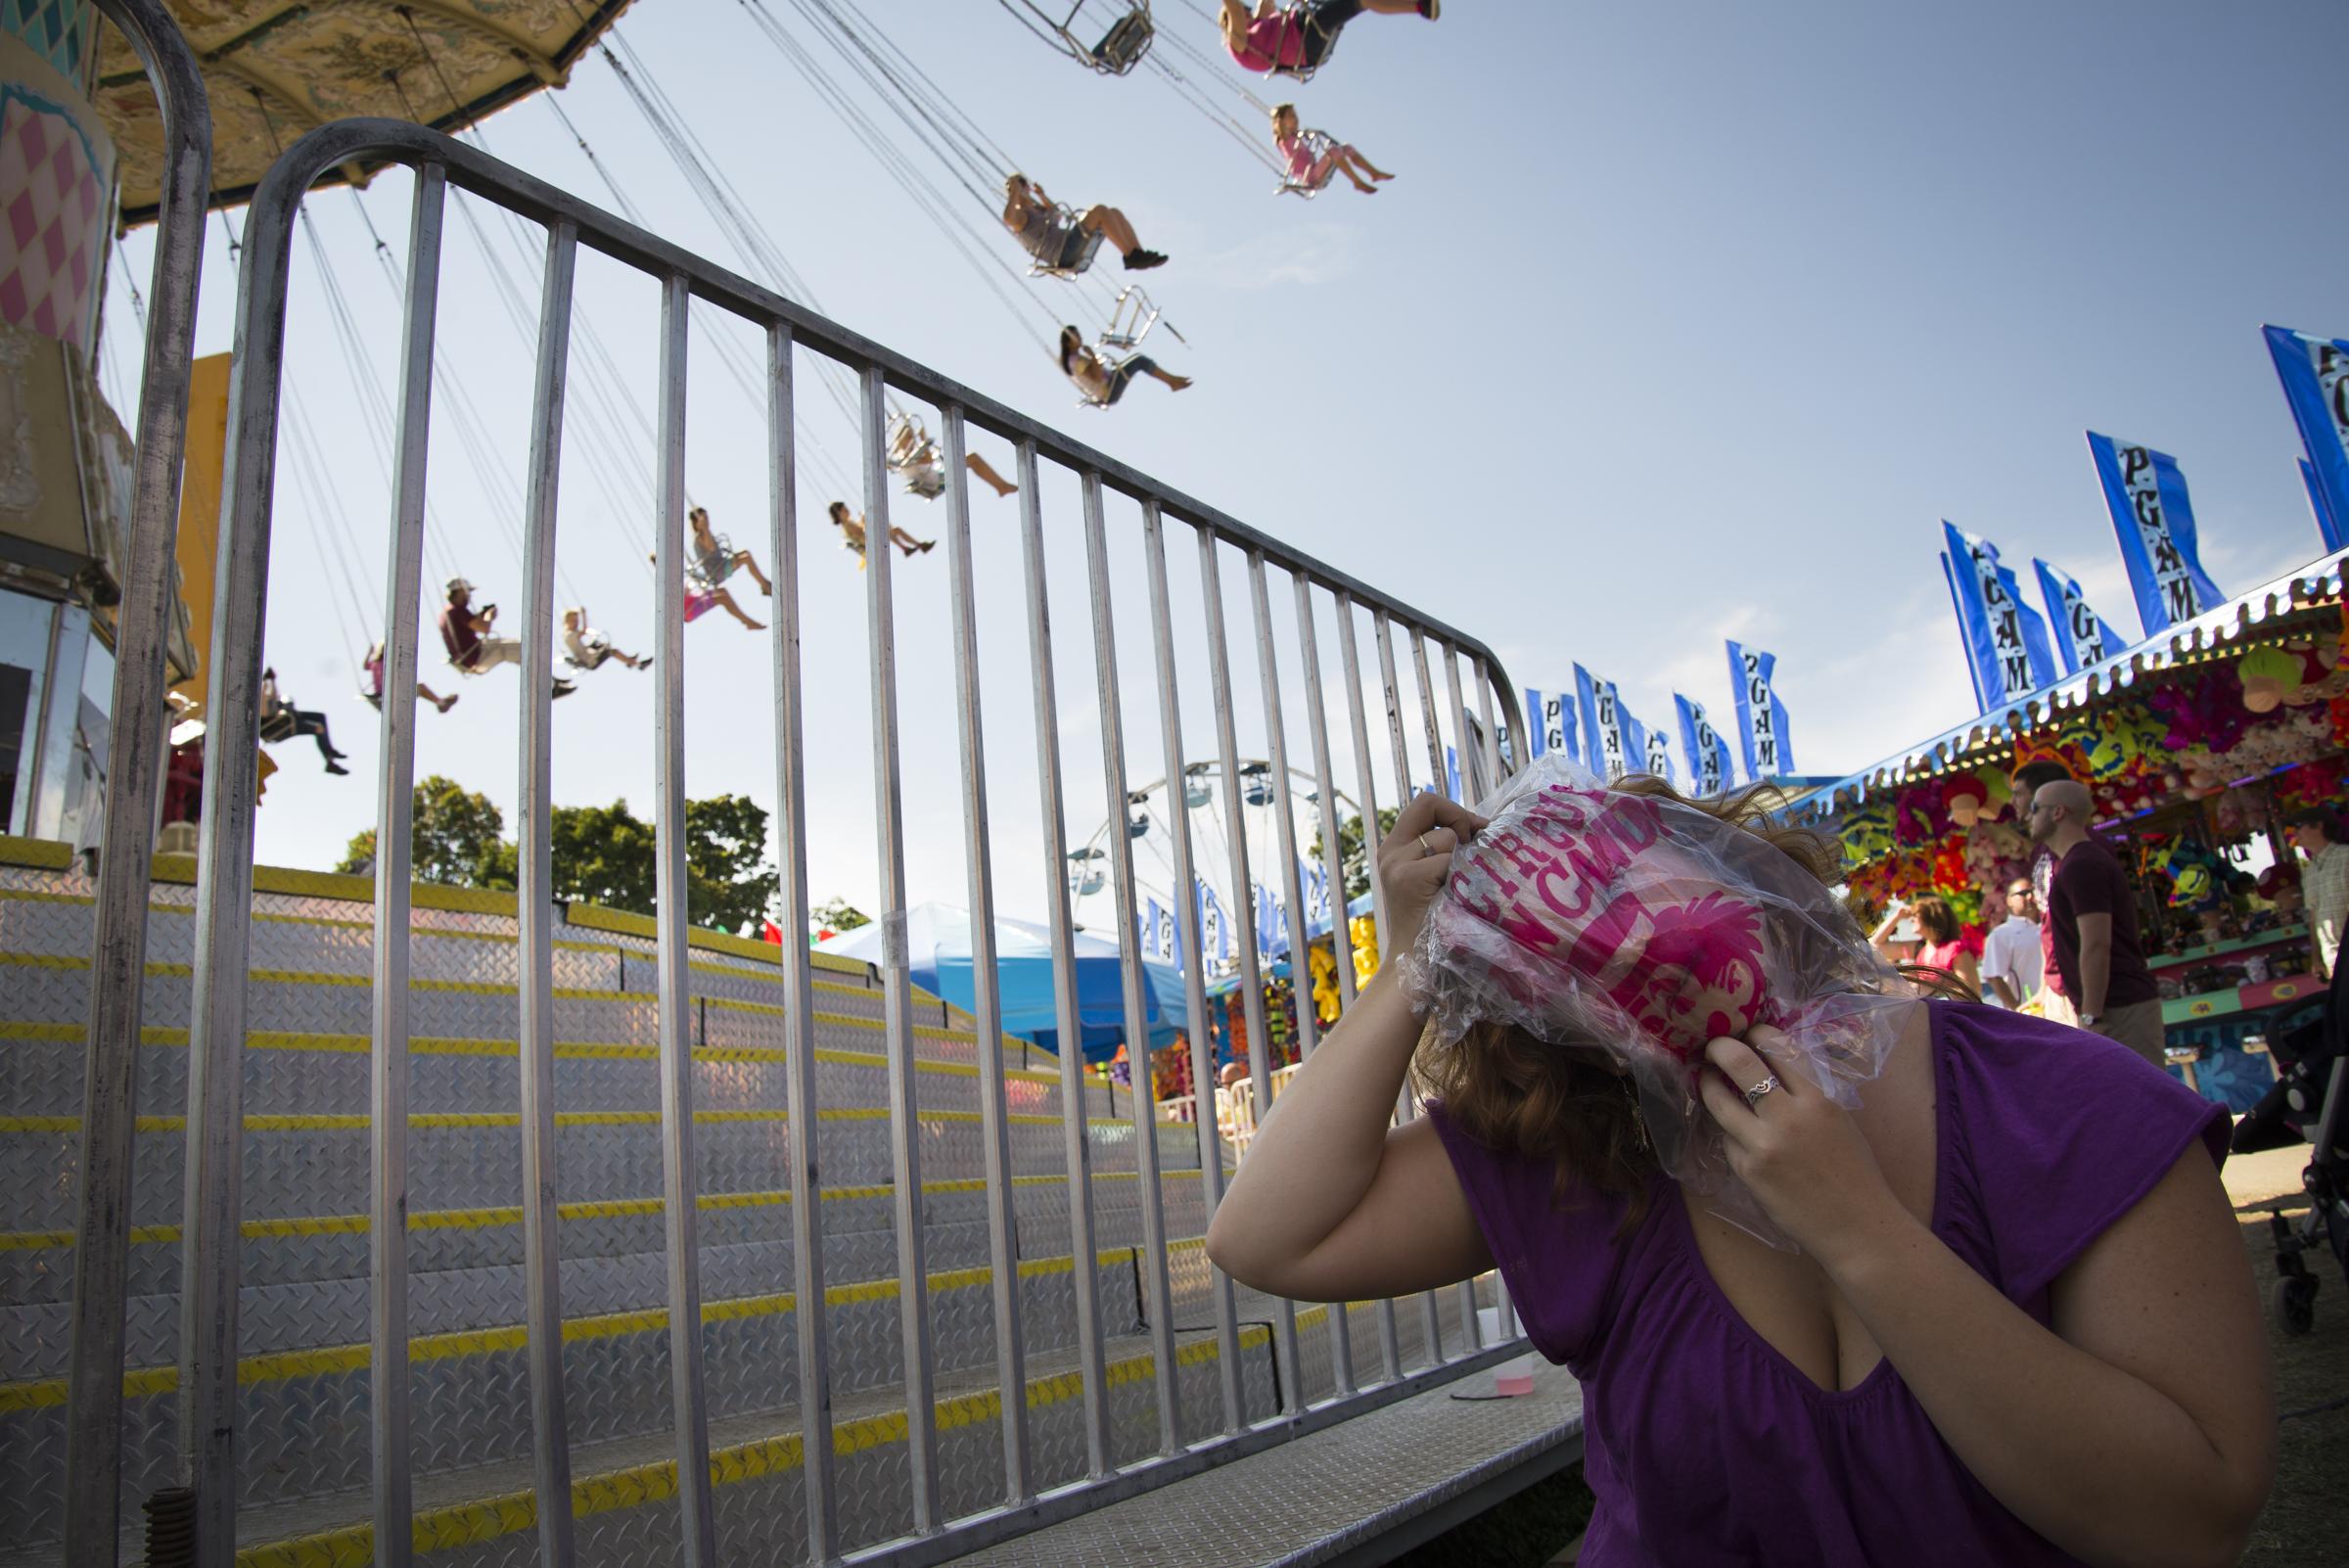 08252013-CarnivalScene-JuliaLuckettPhotography-11